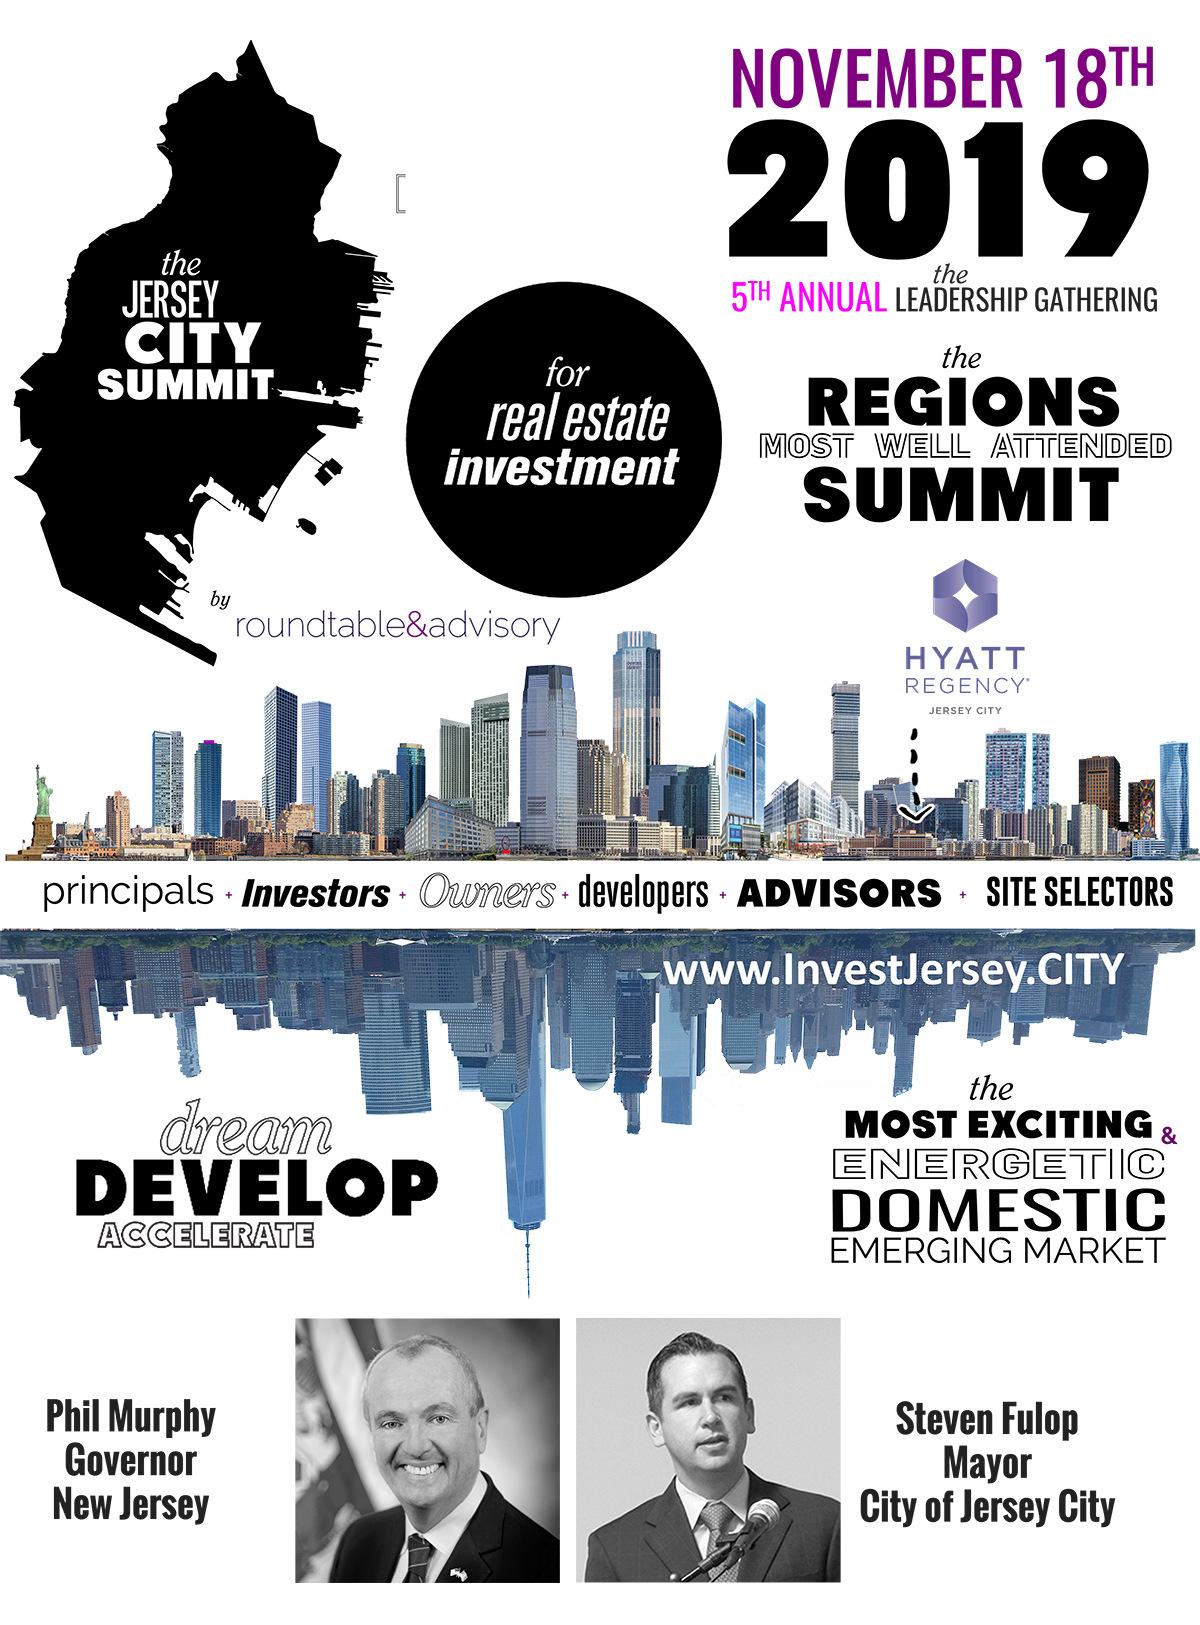 Nov 18, The Jersey City Summit